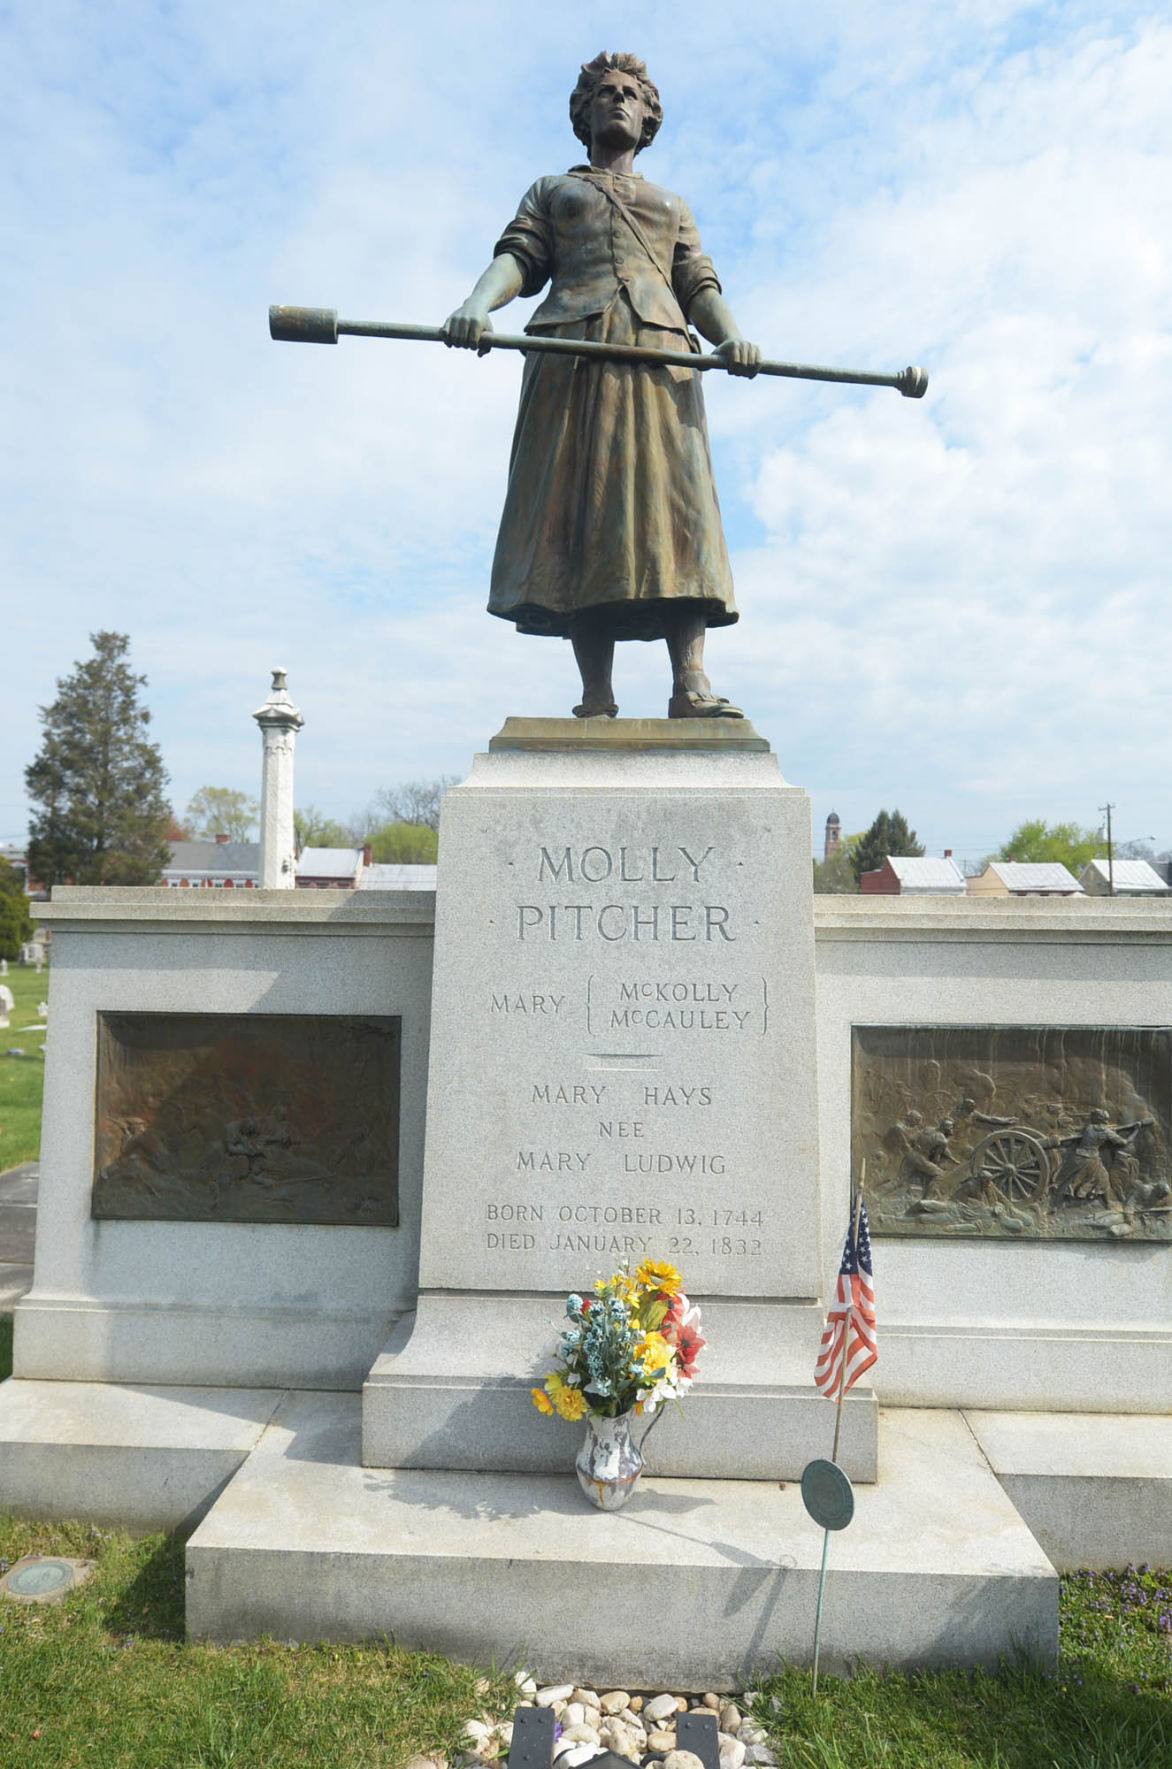 Molly Pitcher gravesite